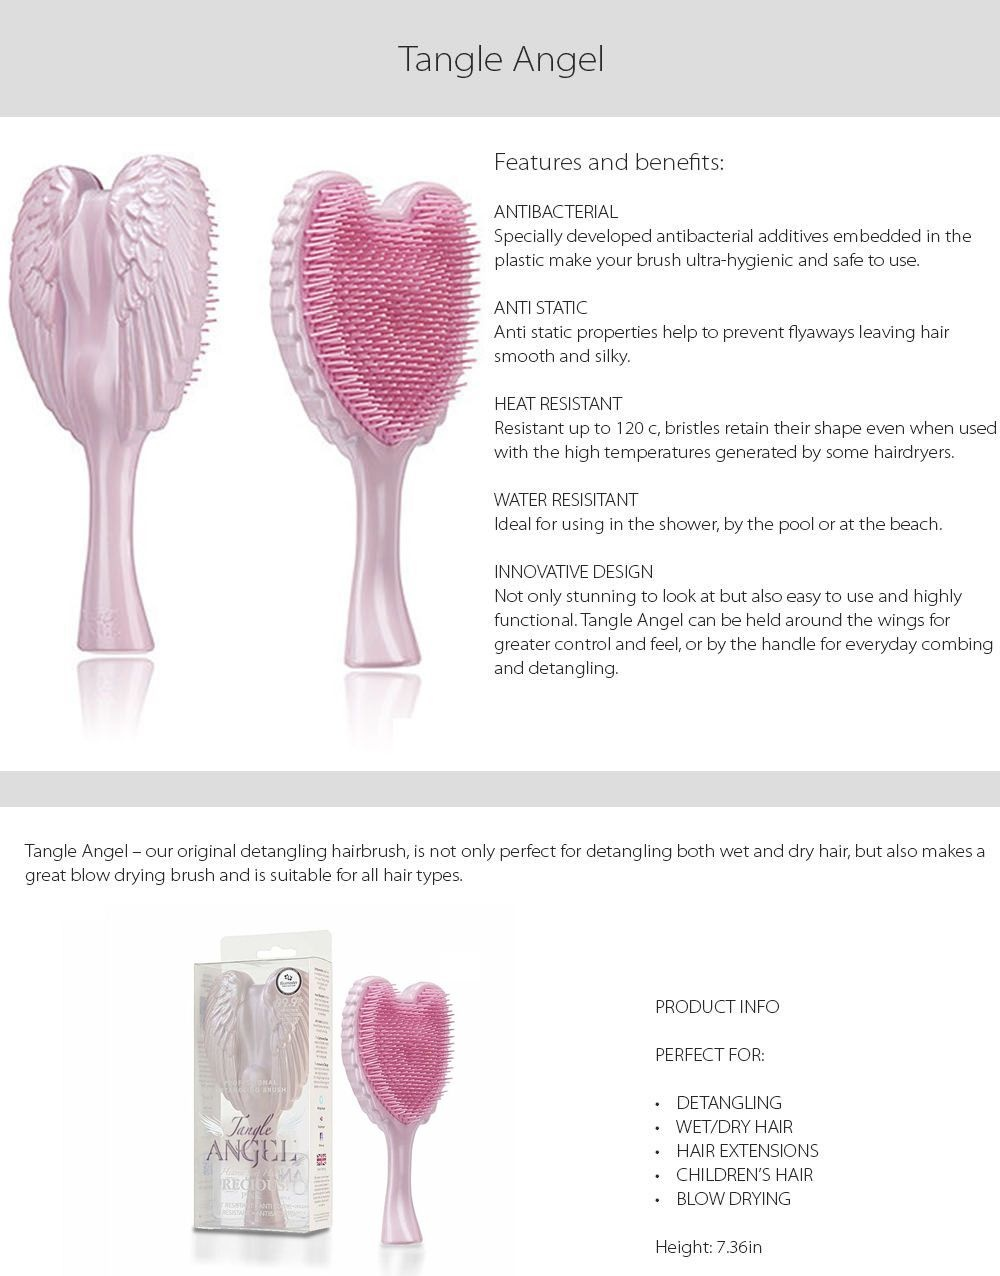 Angel Tangle Hairbrush (Pink) Detangle Your Hair